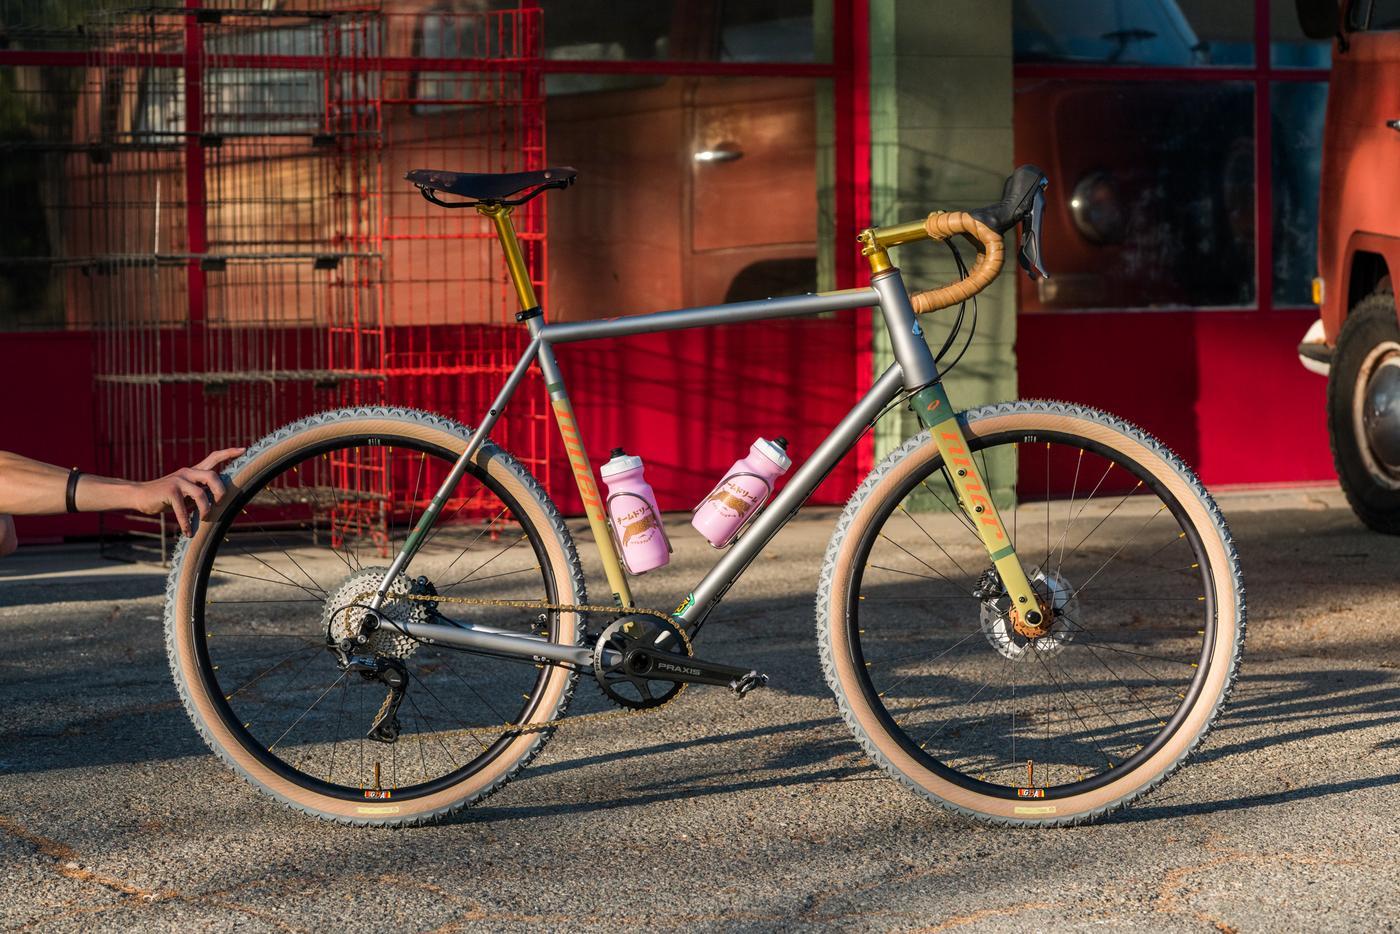 Readers' Rides: Patrick's Niner RLT 9 Steel